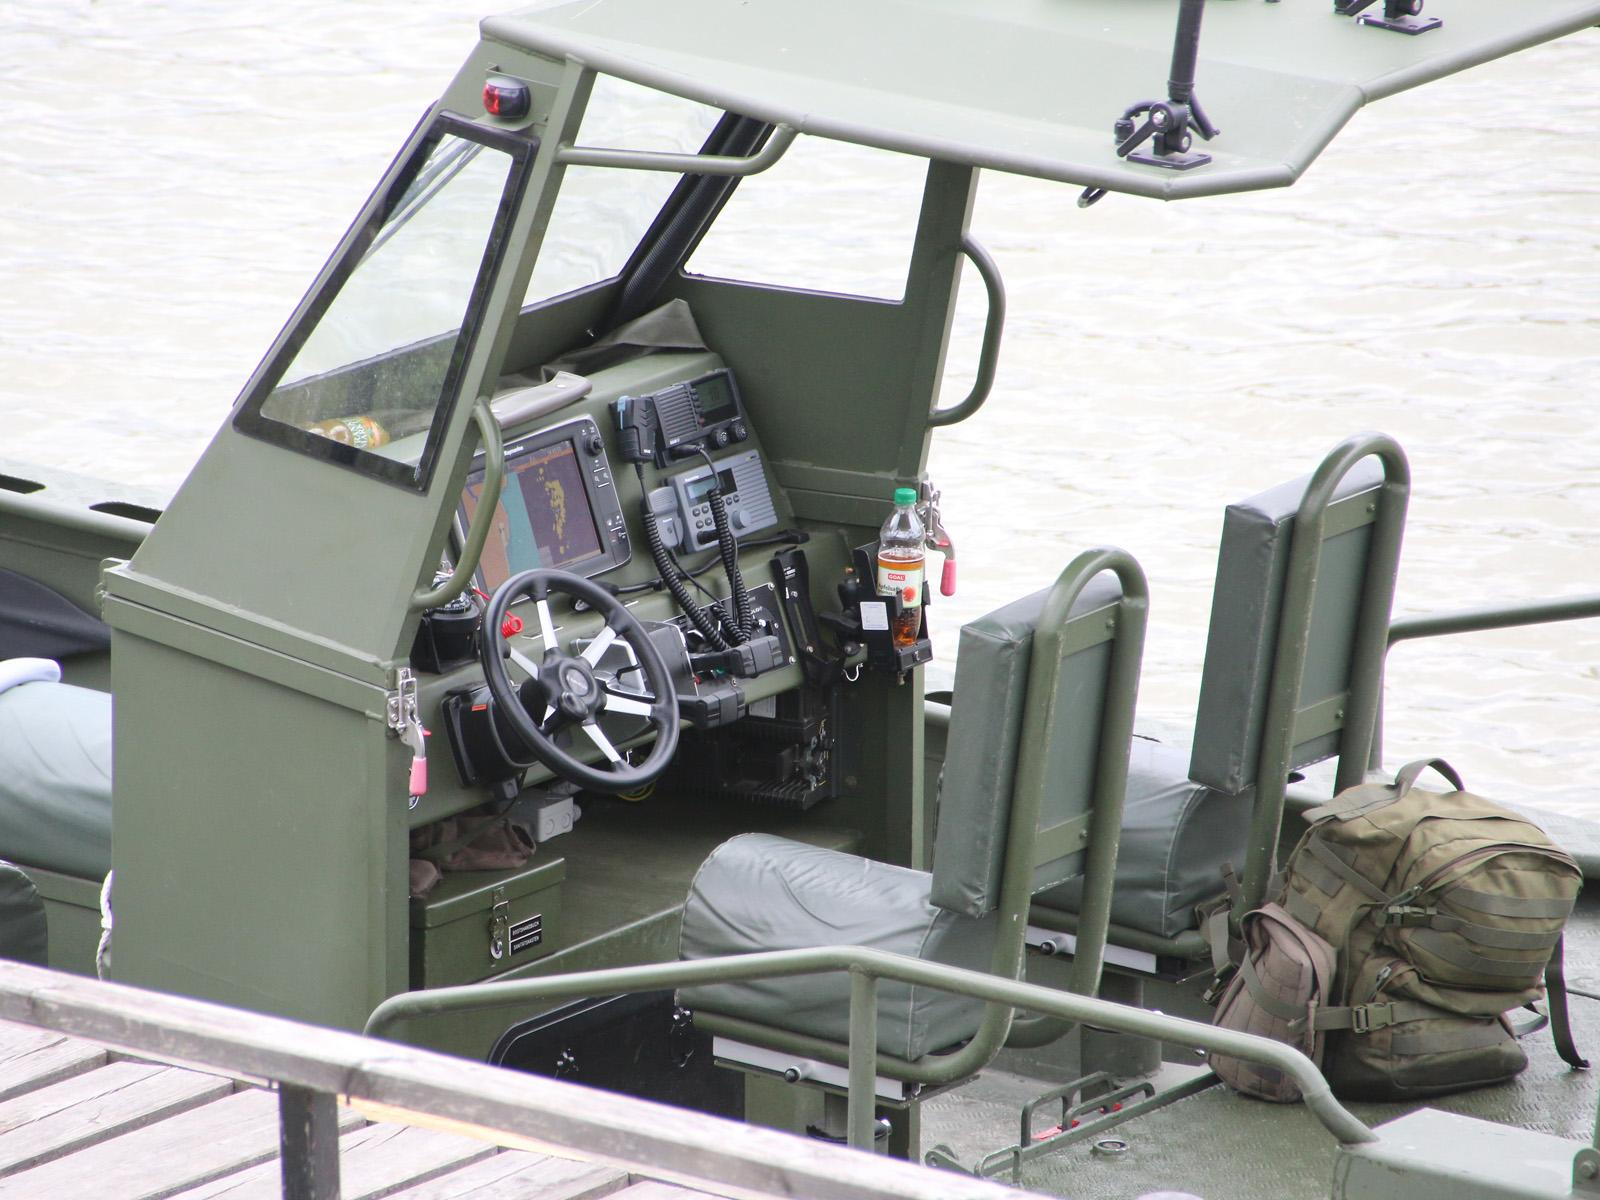 Sturmboot / Flachwasserboot Watercat M9 von Marine Alutech Oy Ab © Doppeladler.com